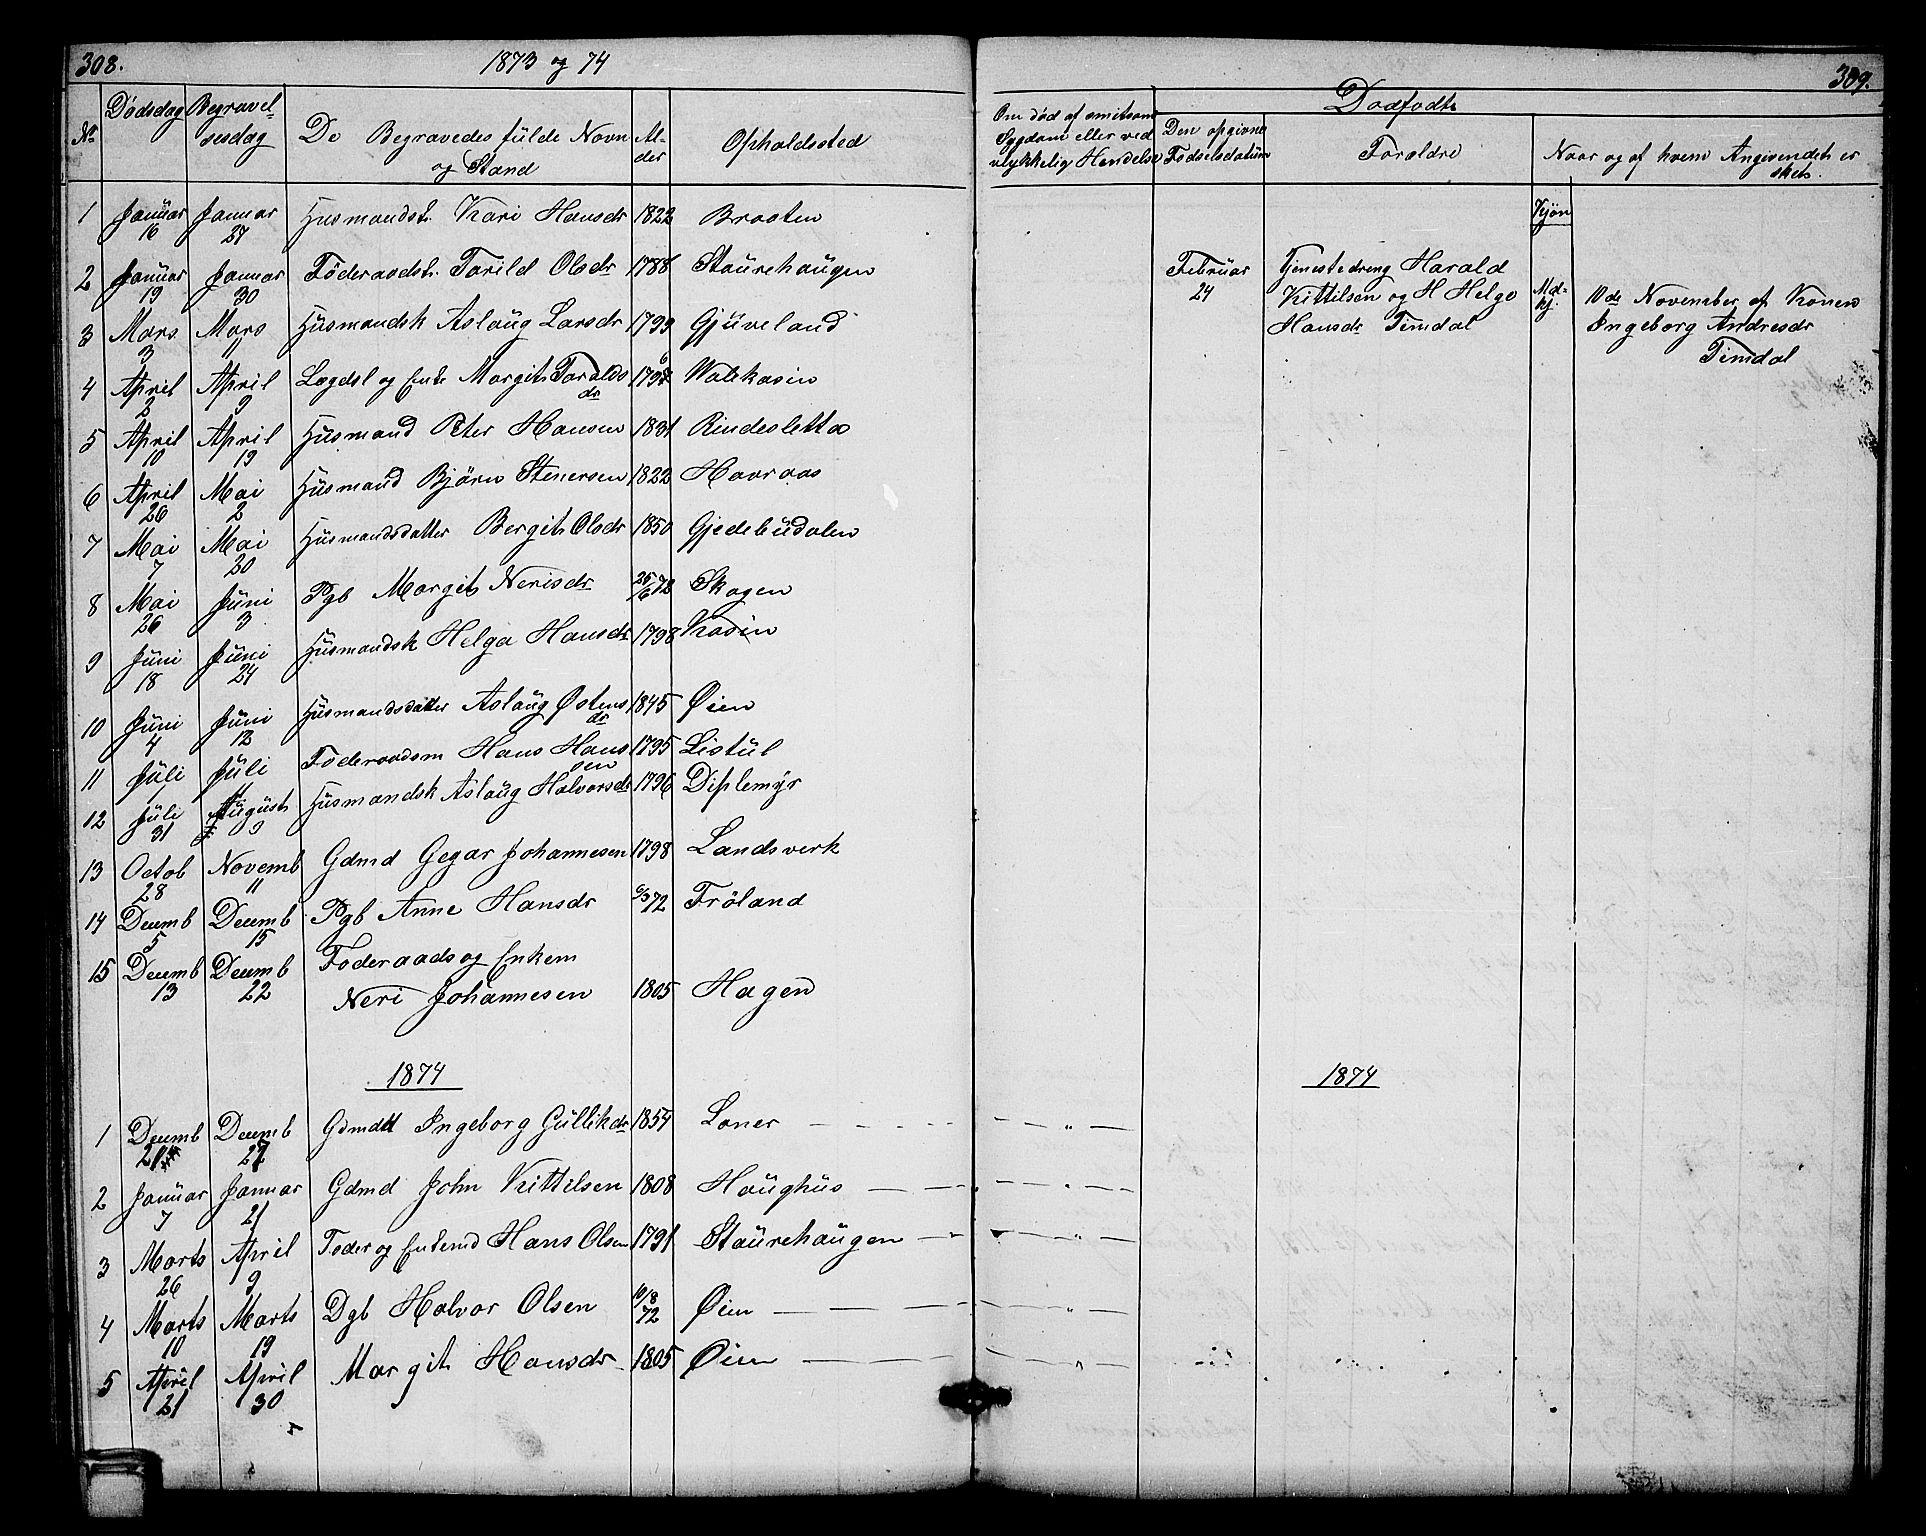 SAKO, Hjartdal kirkebøker, G/Gb/L0002: Klokkerbok nr. II 2, 1854-1884, s. 308-309